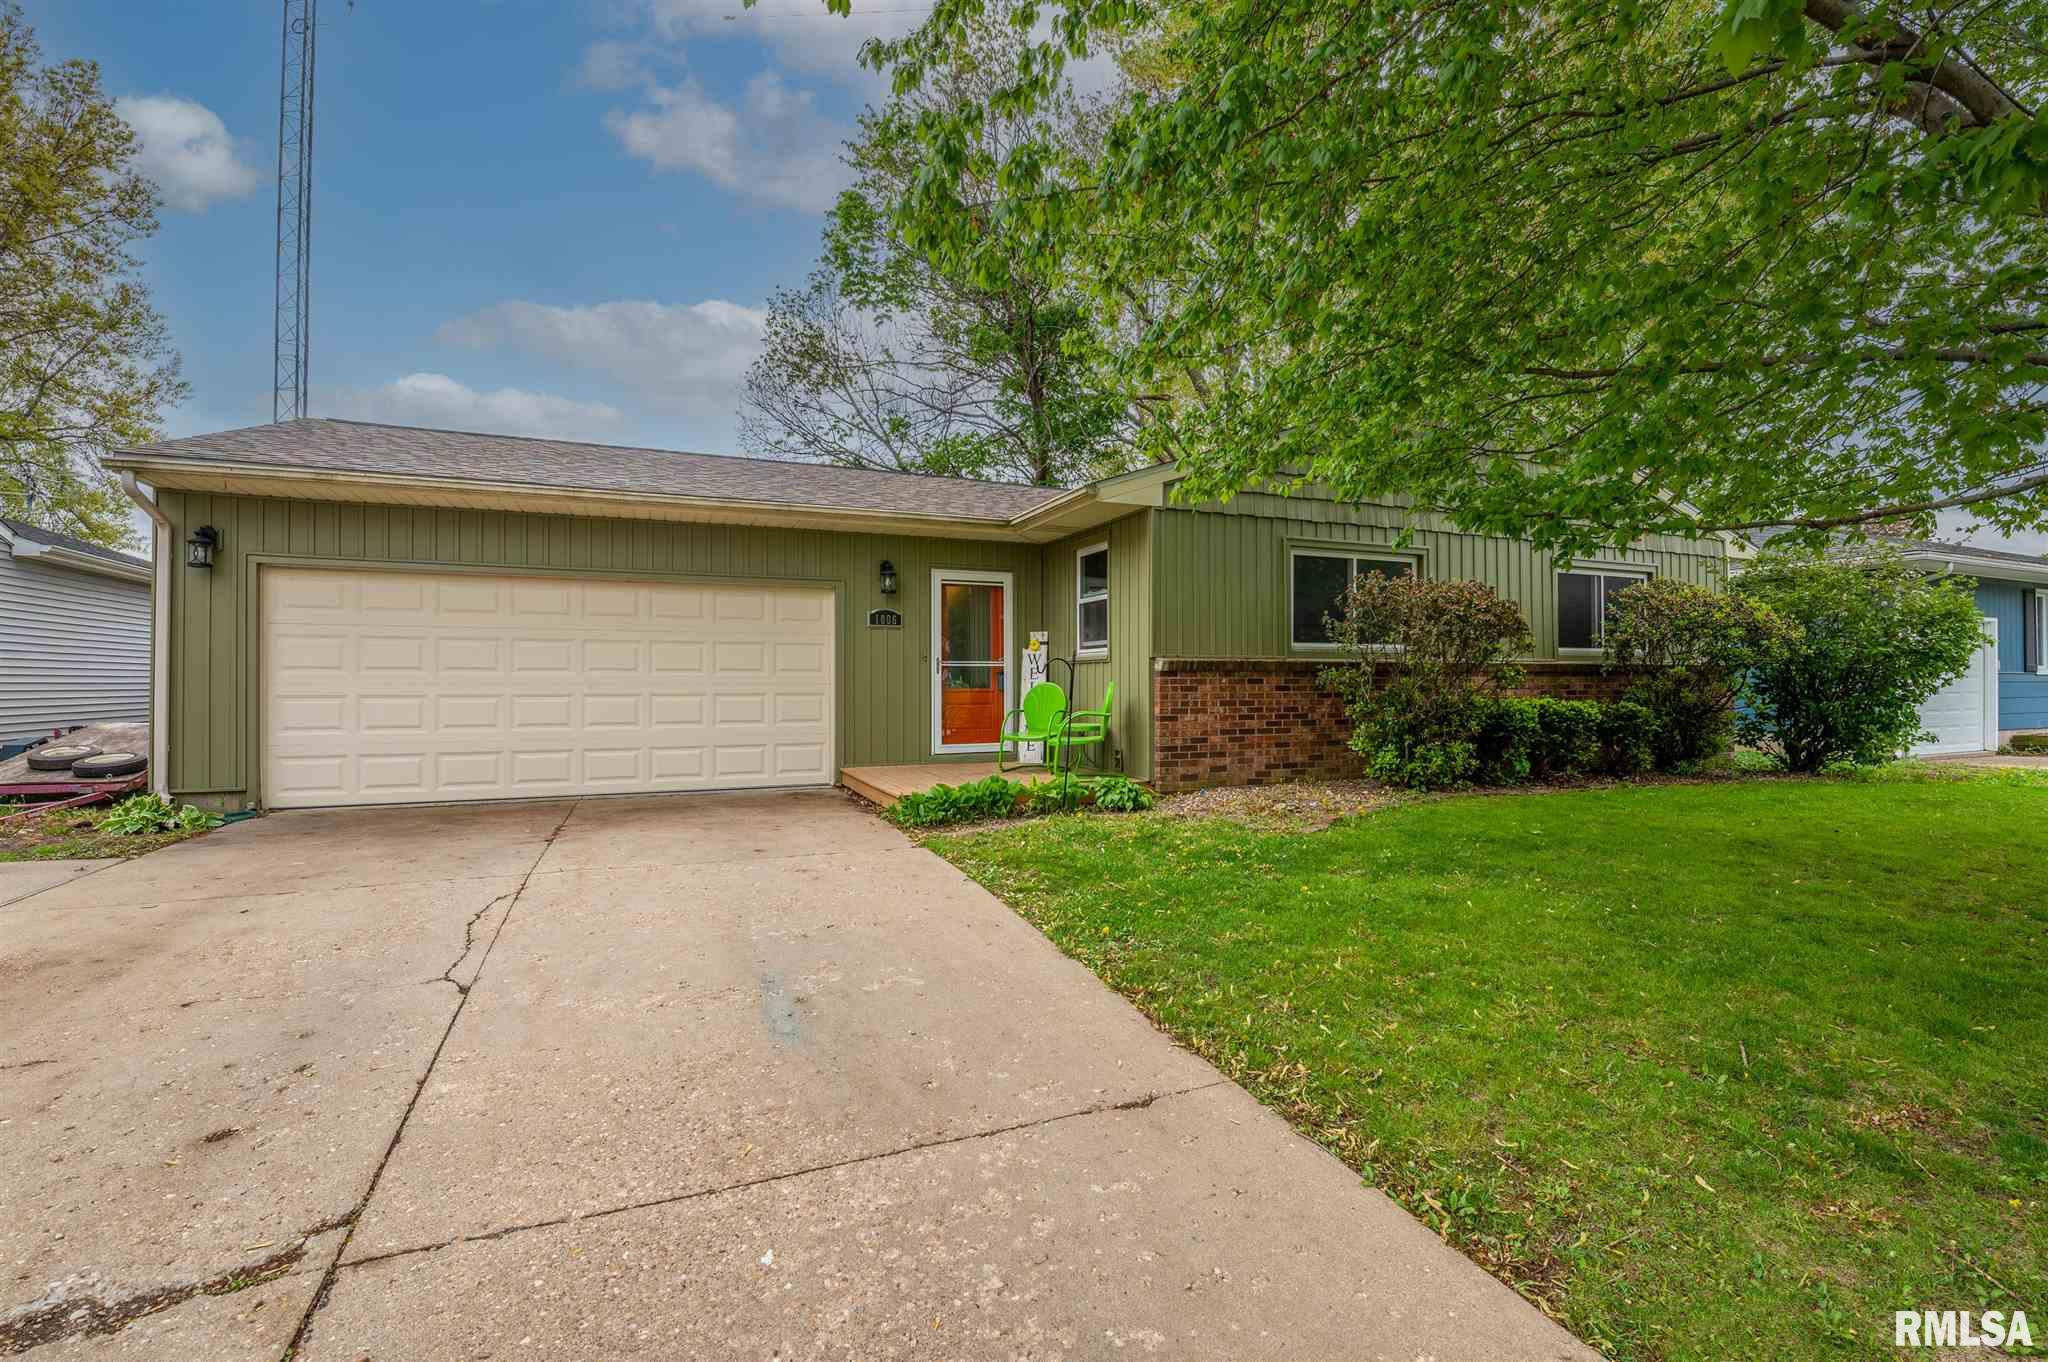 1006 4TH ST A Property Photo - Hampton, IL real estate listing